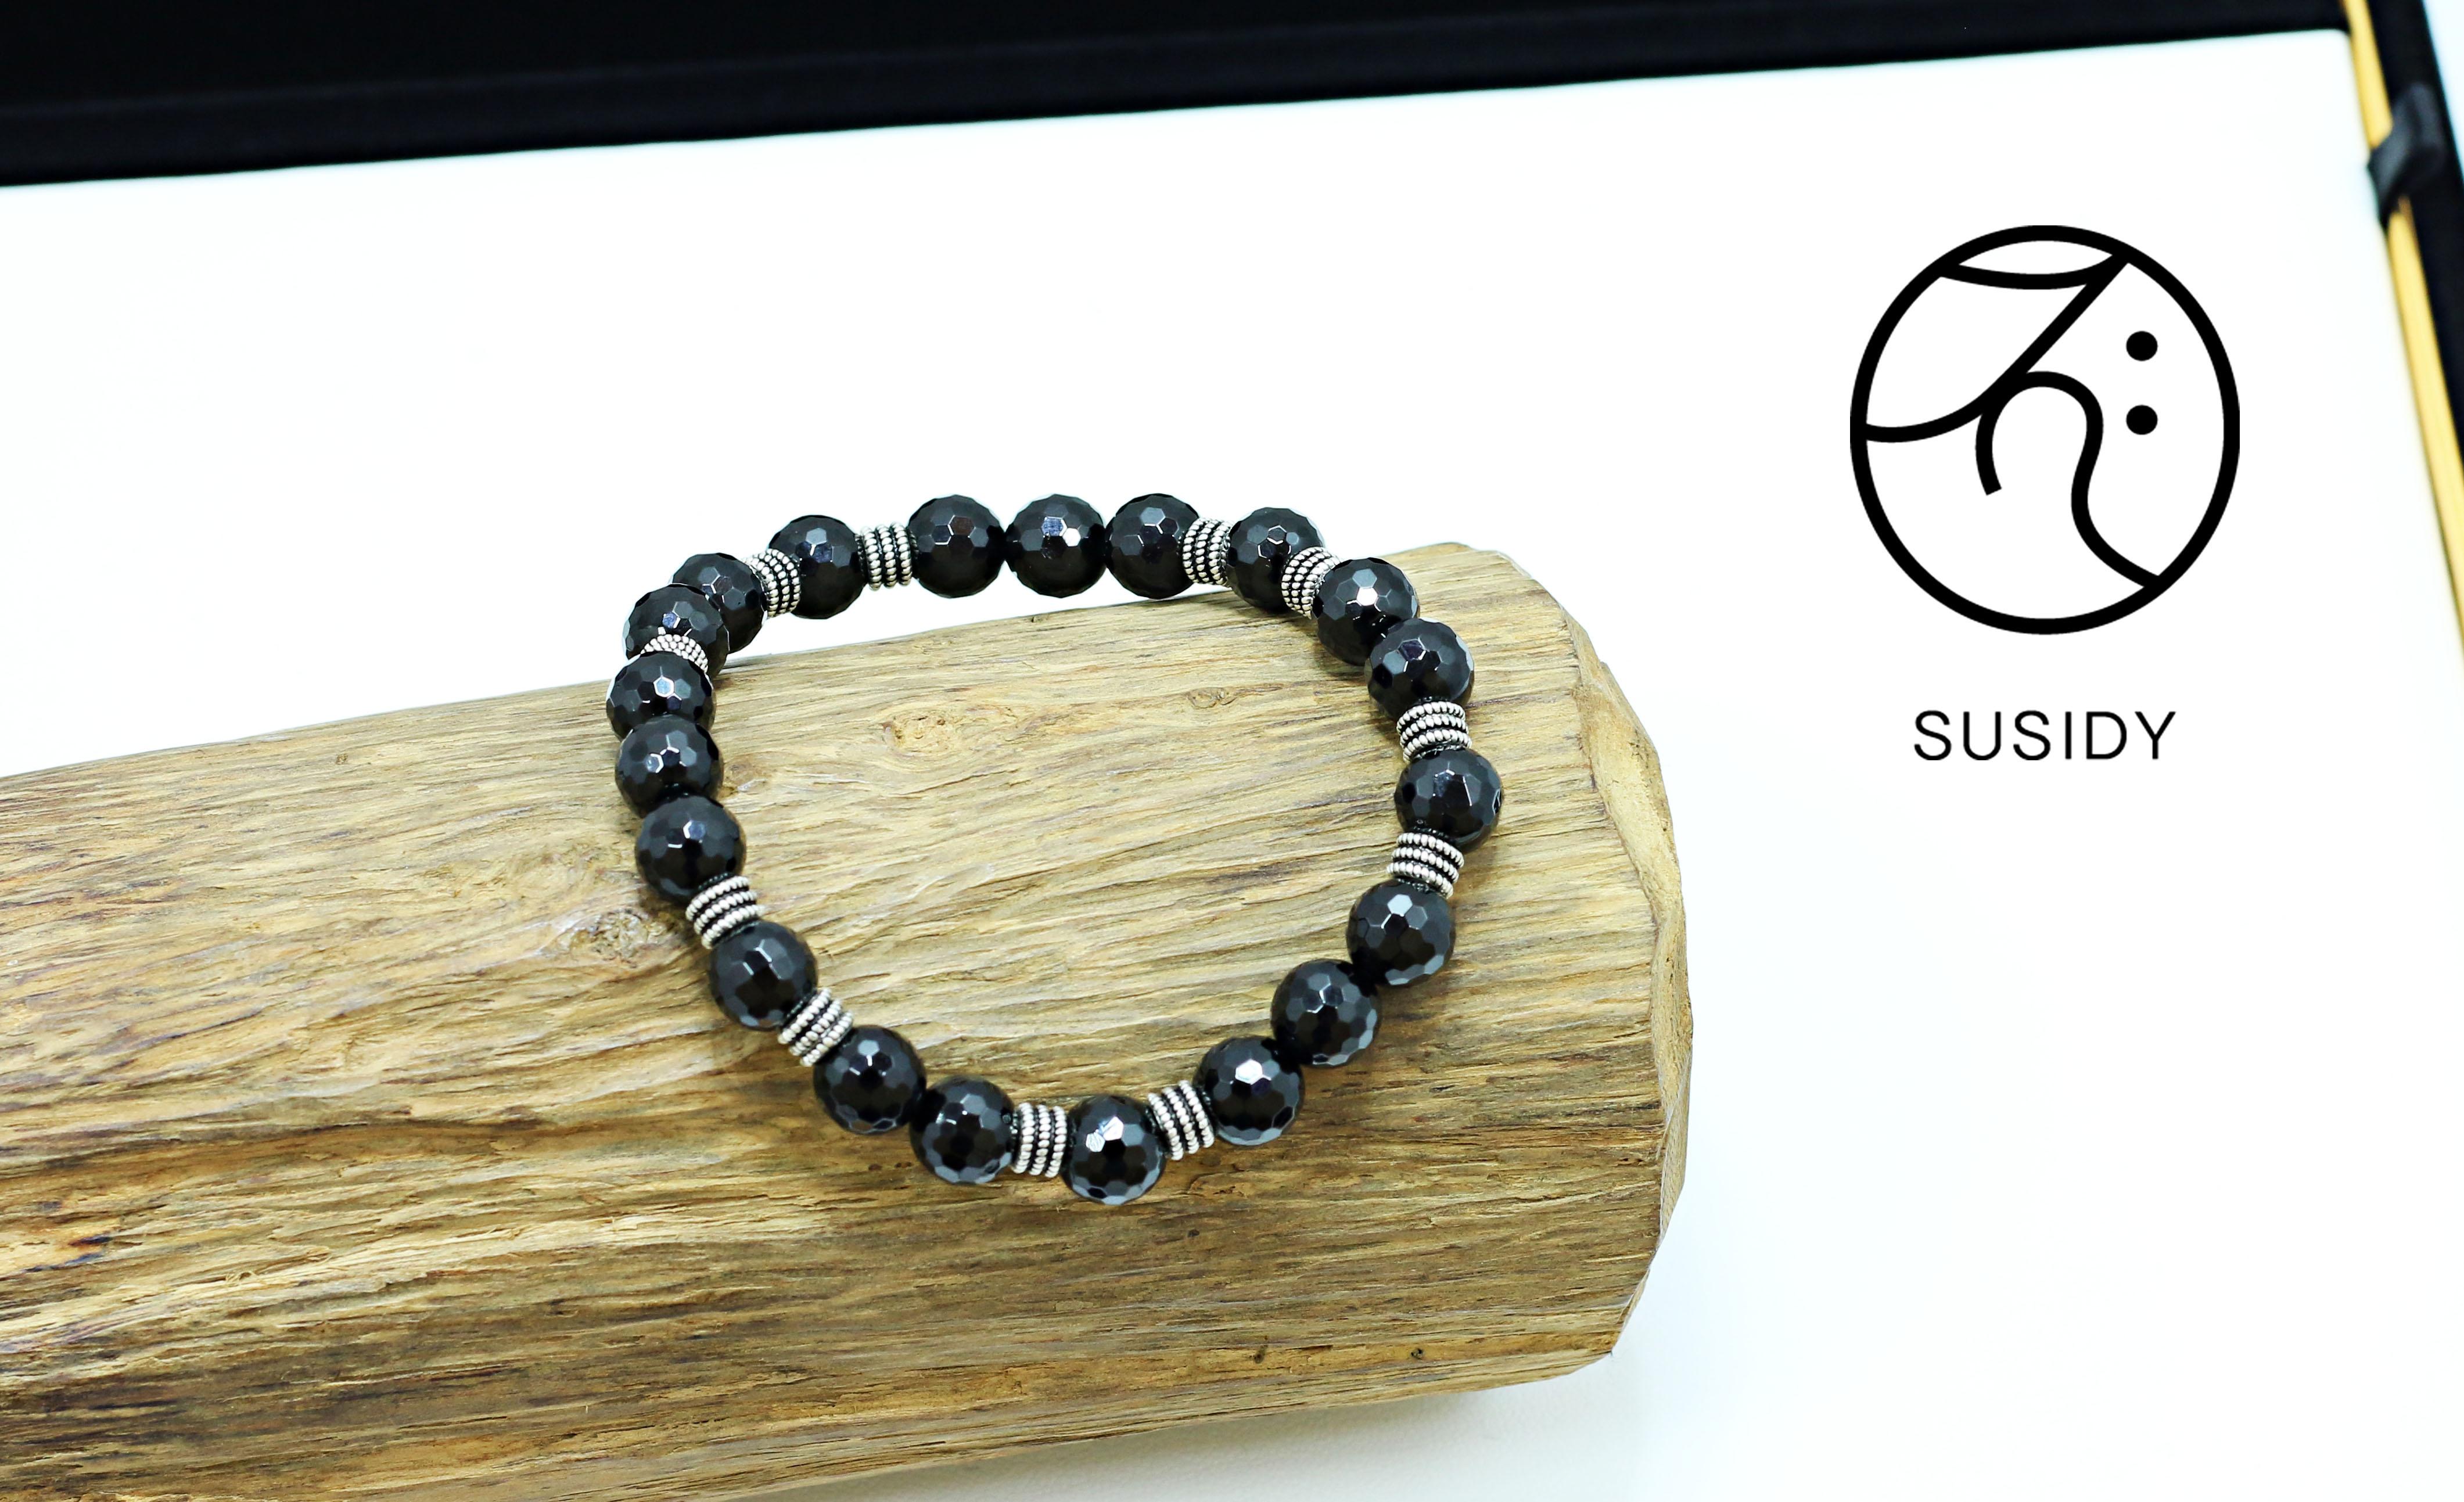 SusidyDesign - 黑碧璽 手珠銀飾